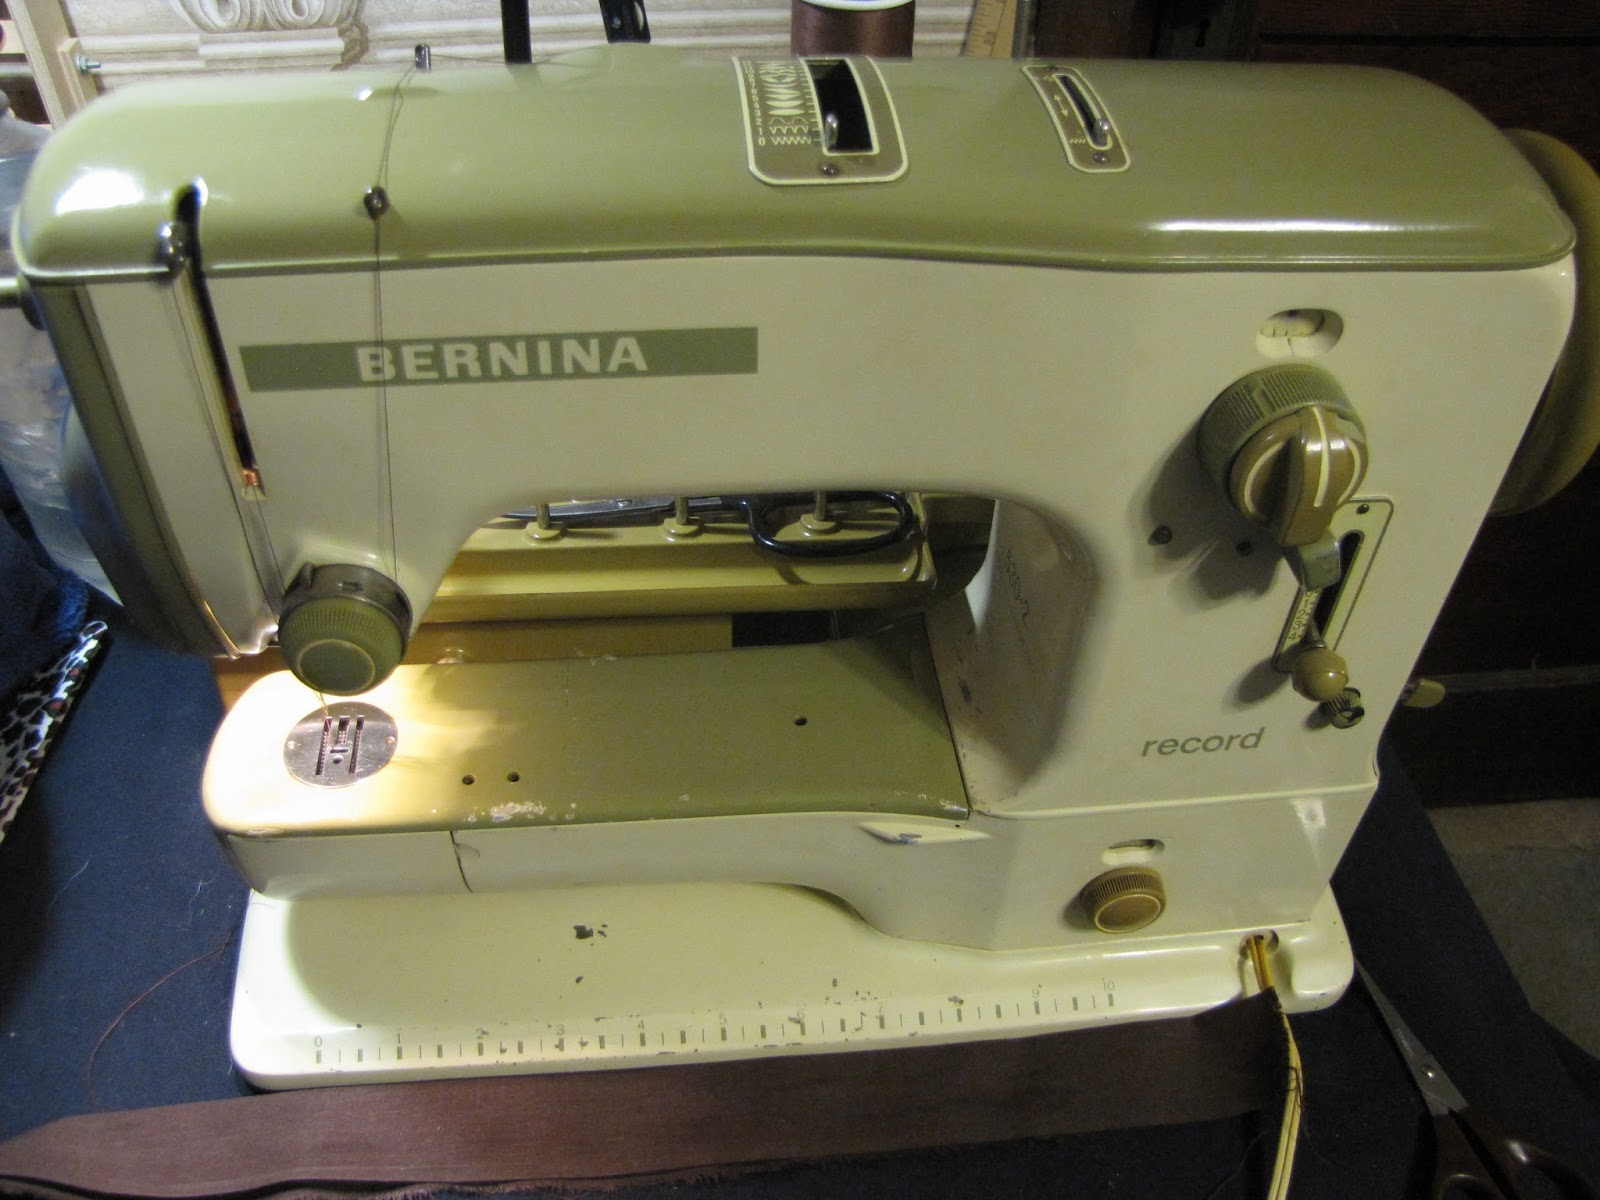 vintage sewing machines bernina sewing machine jpg 1600x1200 used bernina sewing machines sale [ 1600 x 1200 Pixel ]